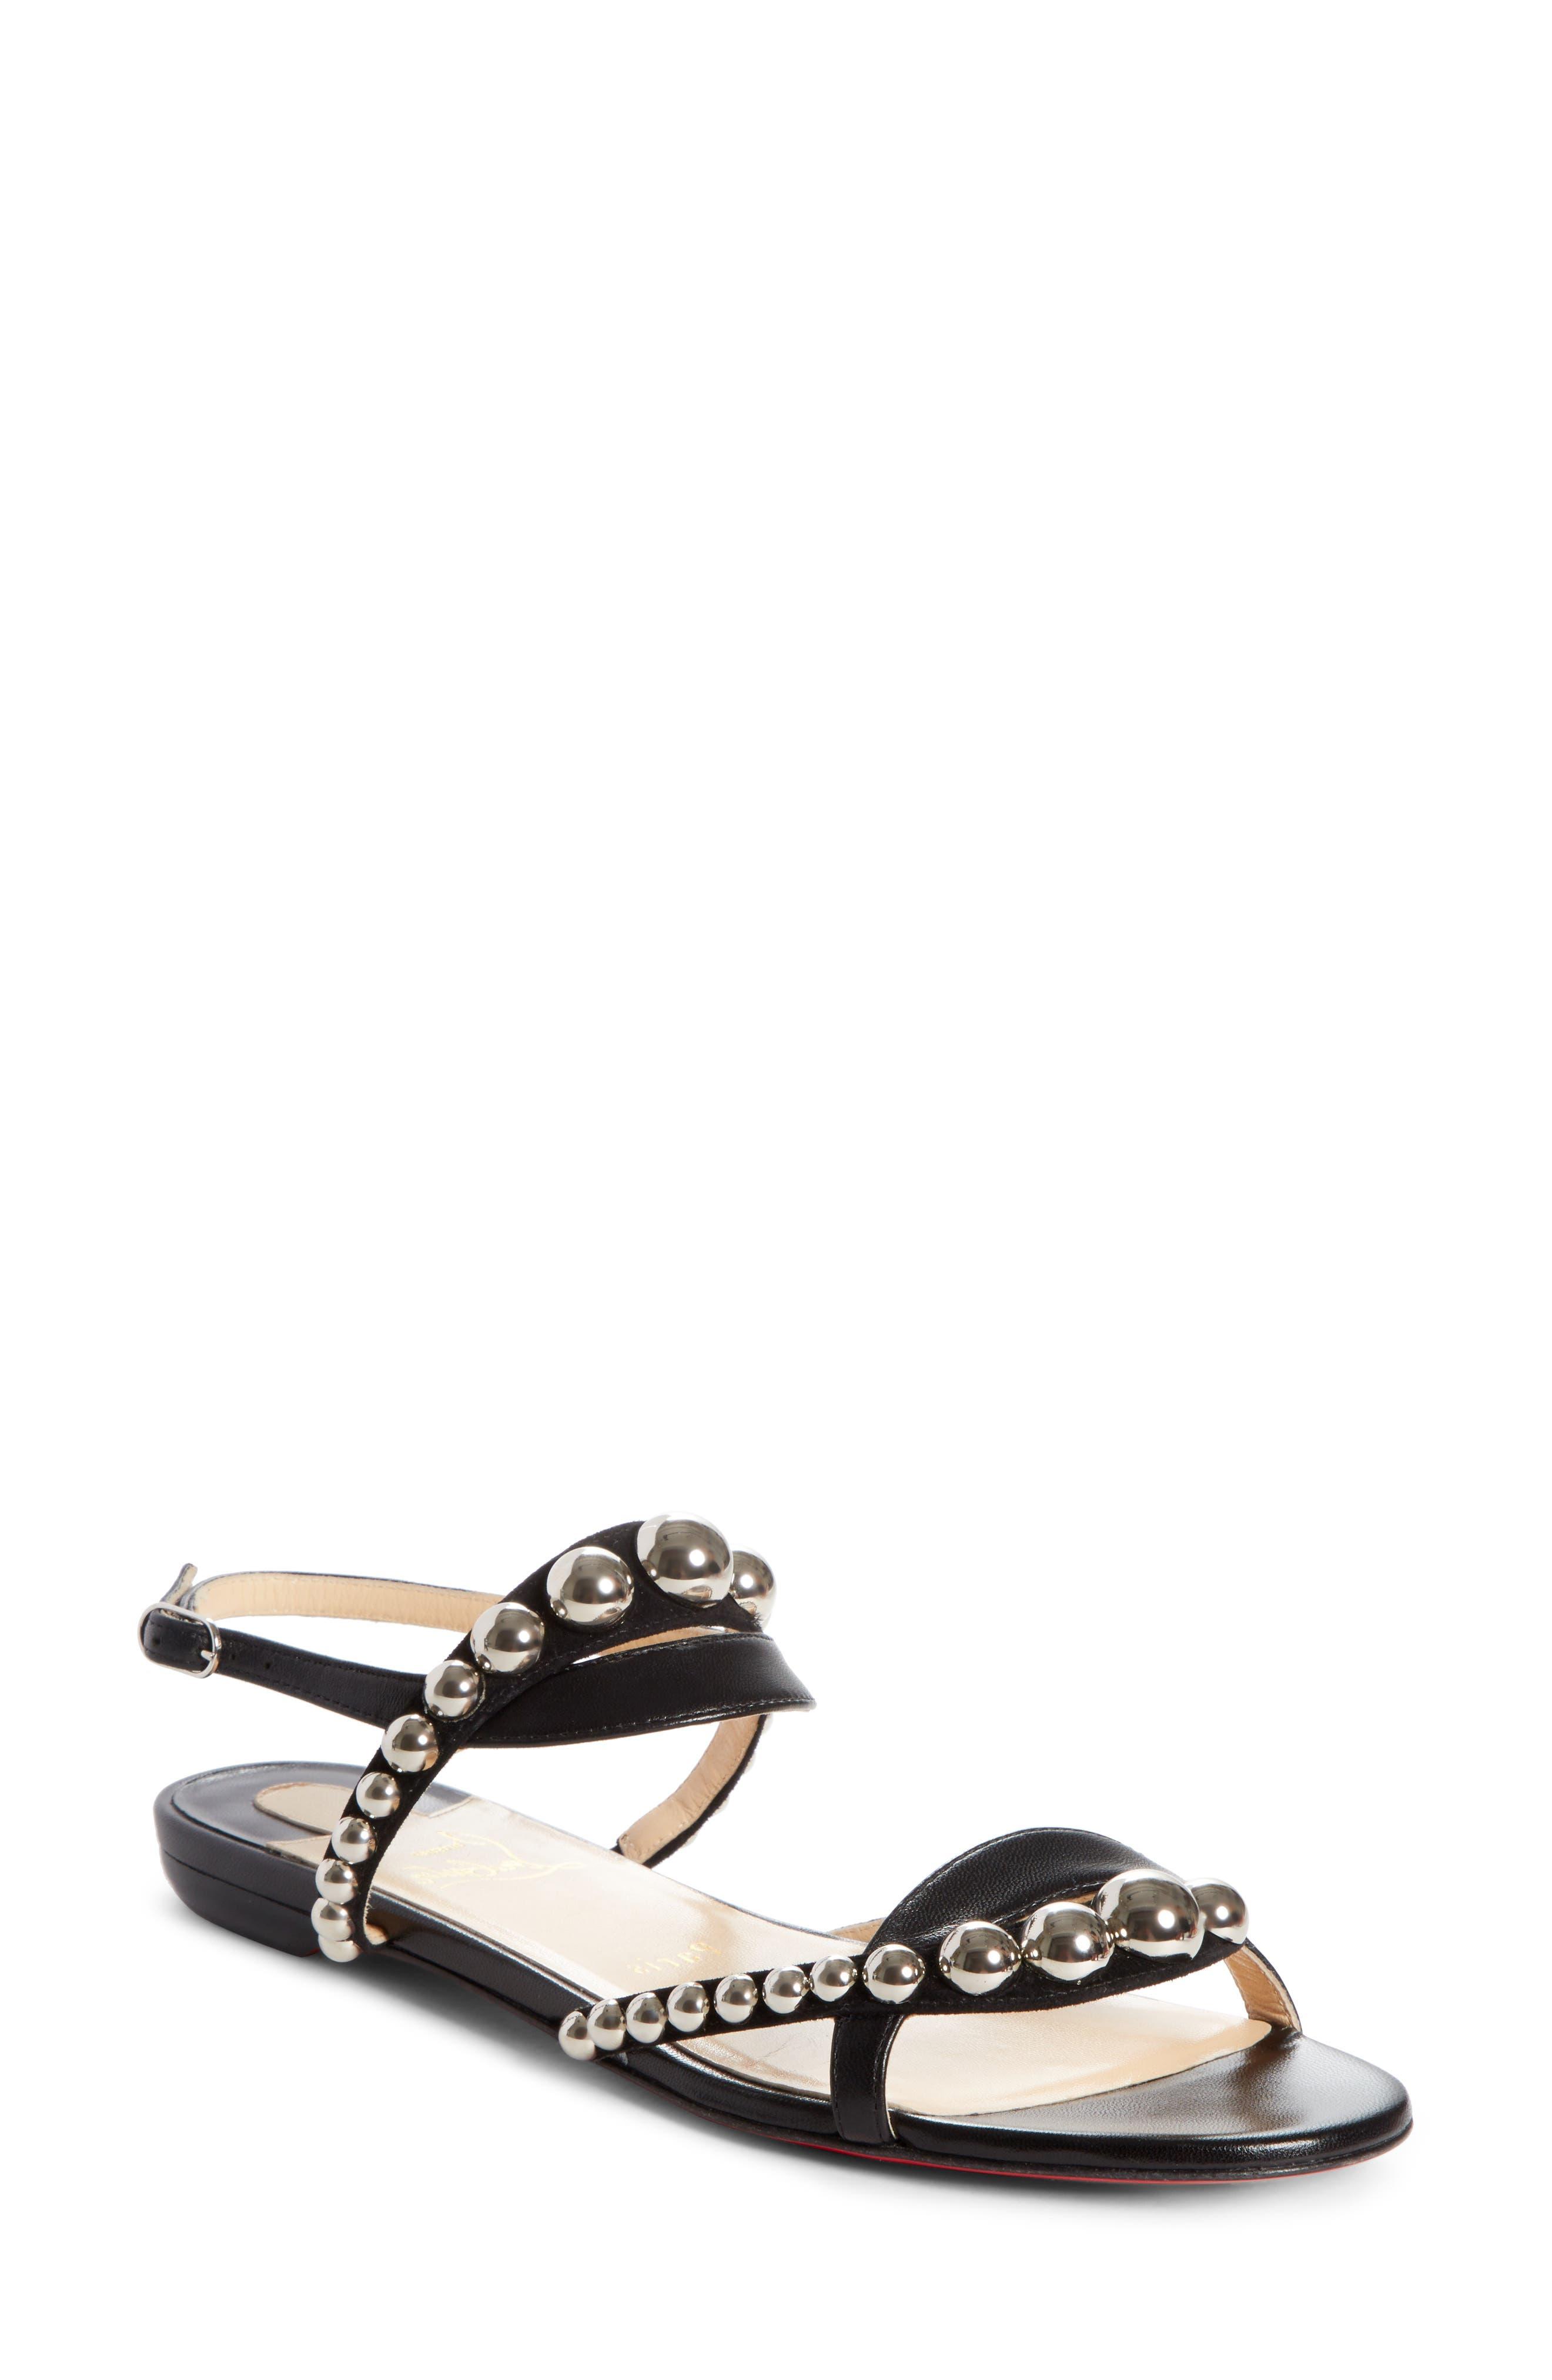 Galeria Ornament Flat Sandal,                         Main,                         color, BLACK/ SILVER